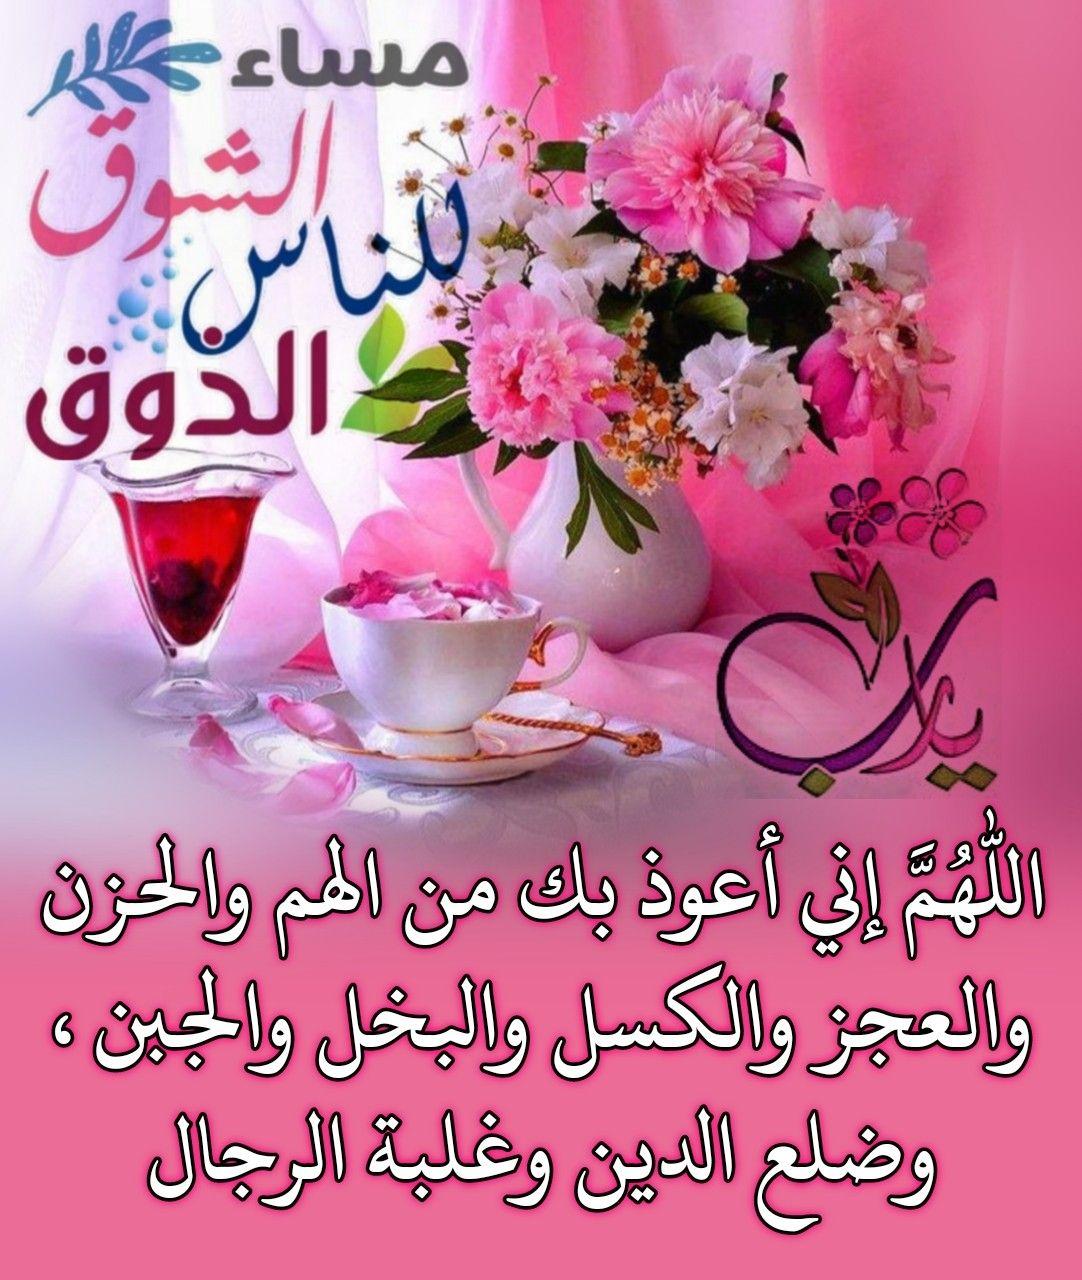 Pin By Khulood Om Hamoudy On مساء الخير Good Night Night Best